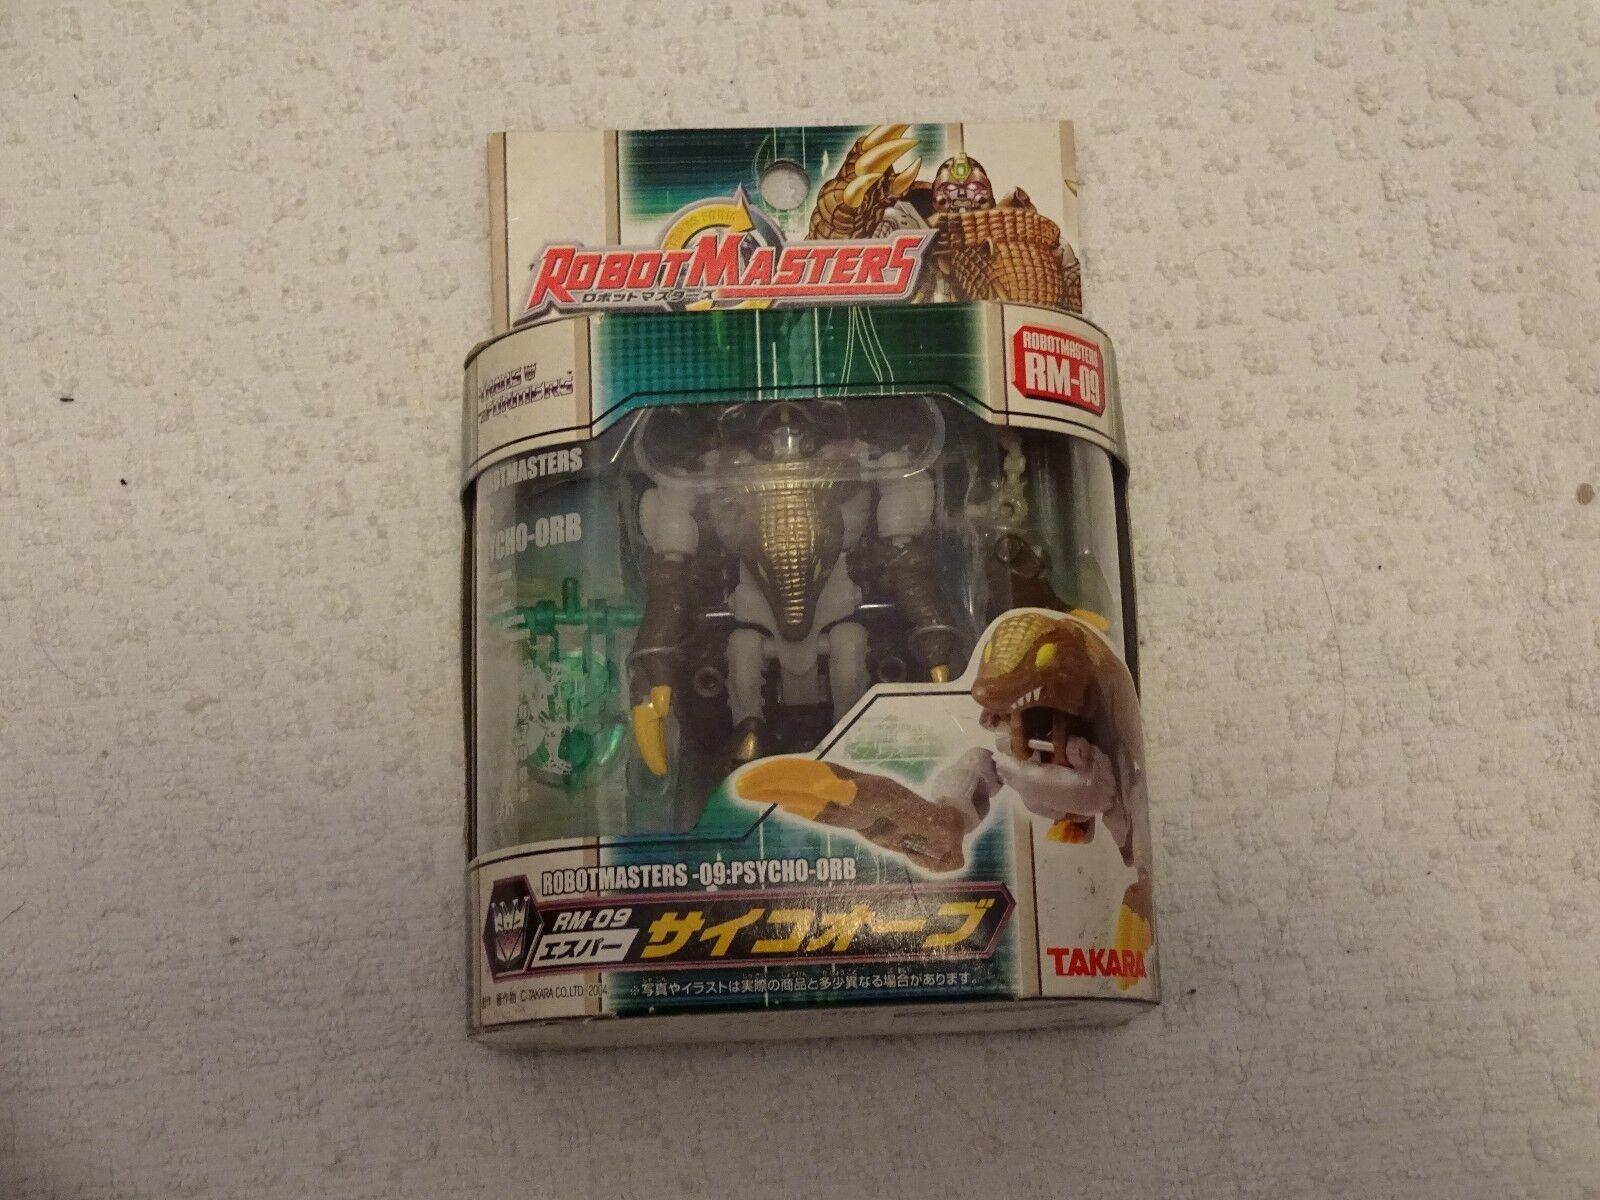 Transformers Robotmasters RM-09 Psycho-Orb Figure Takara New Free Shipping